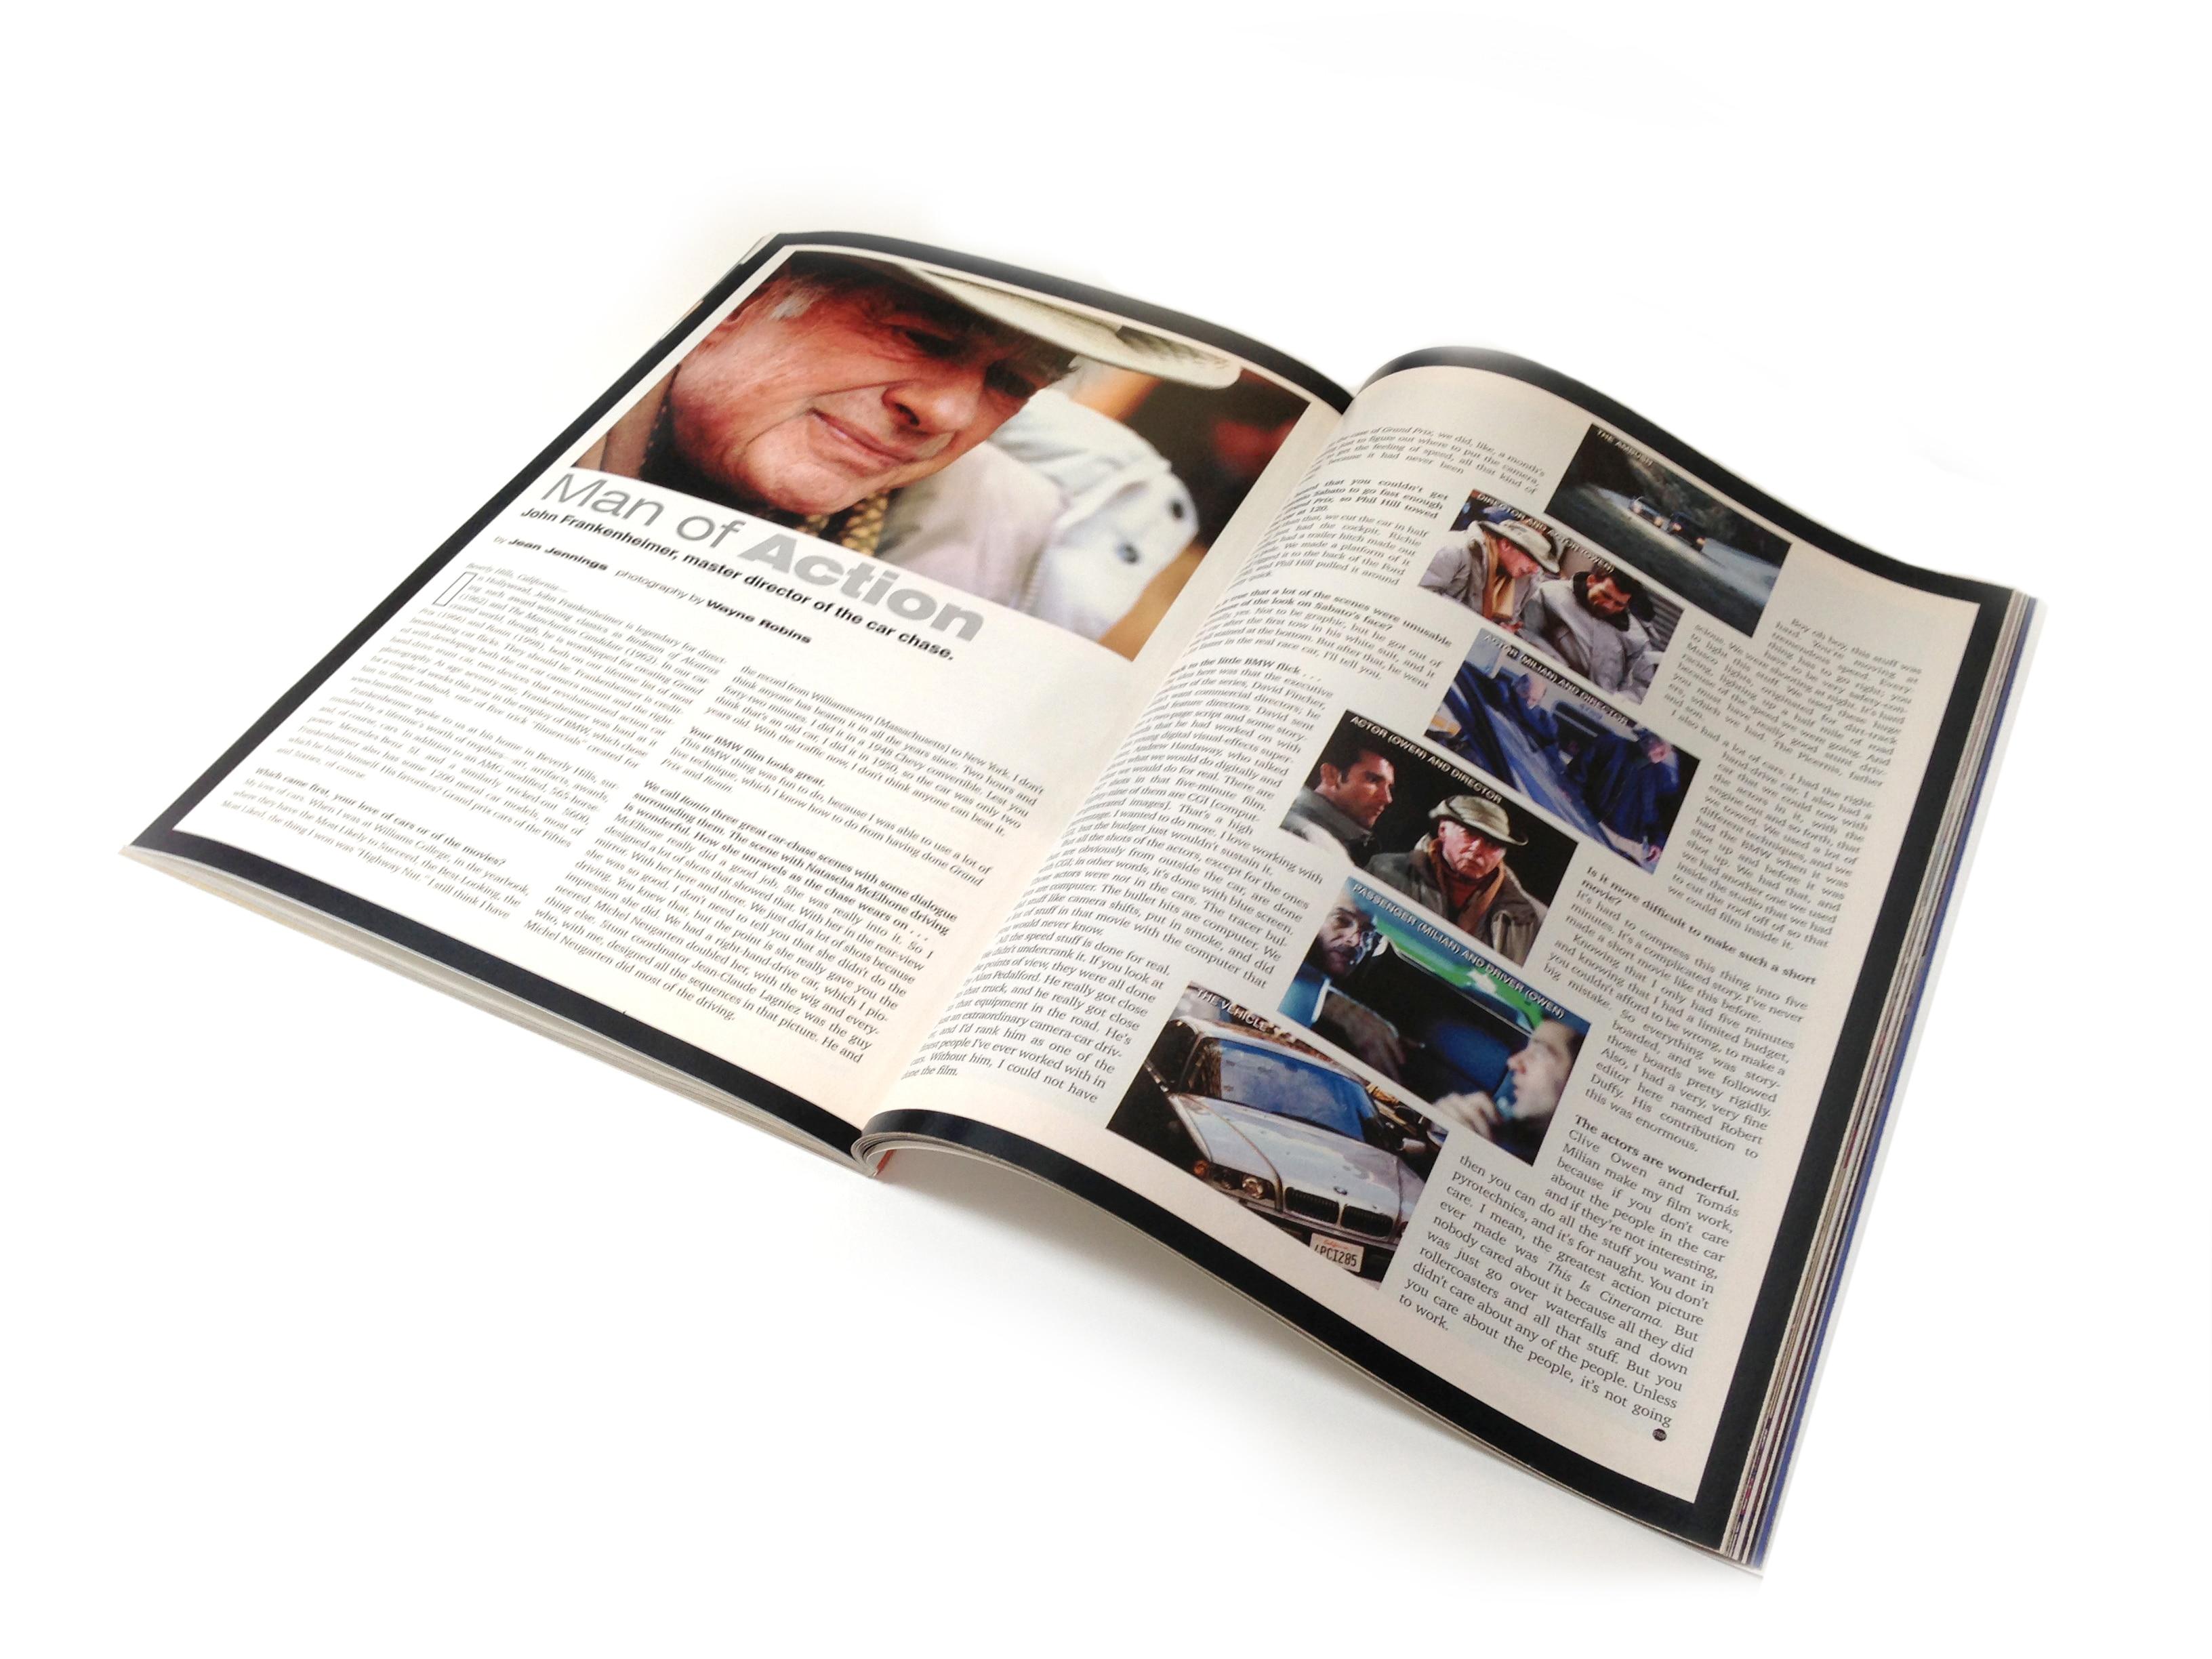 Original Interview John Frankenheimer July 2001 Issue